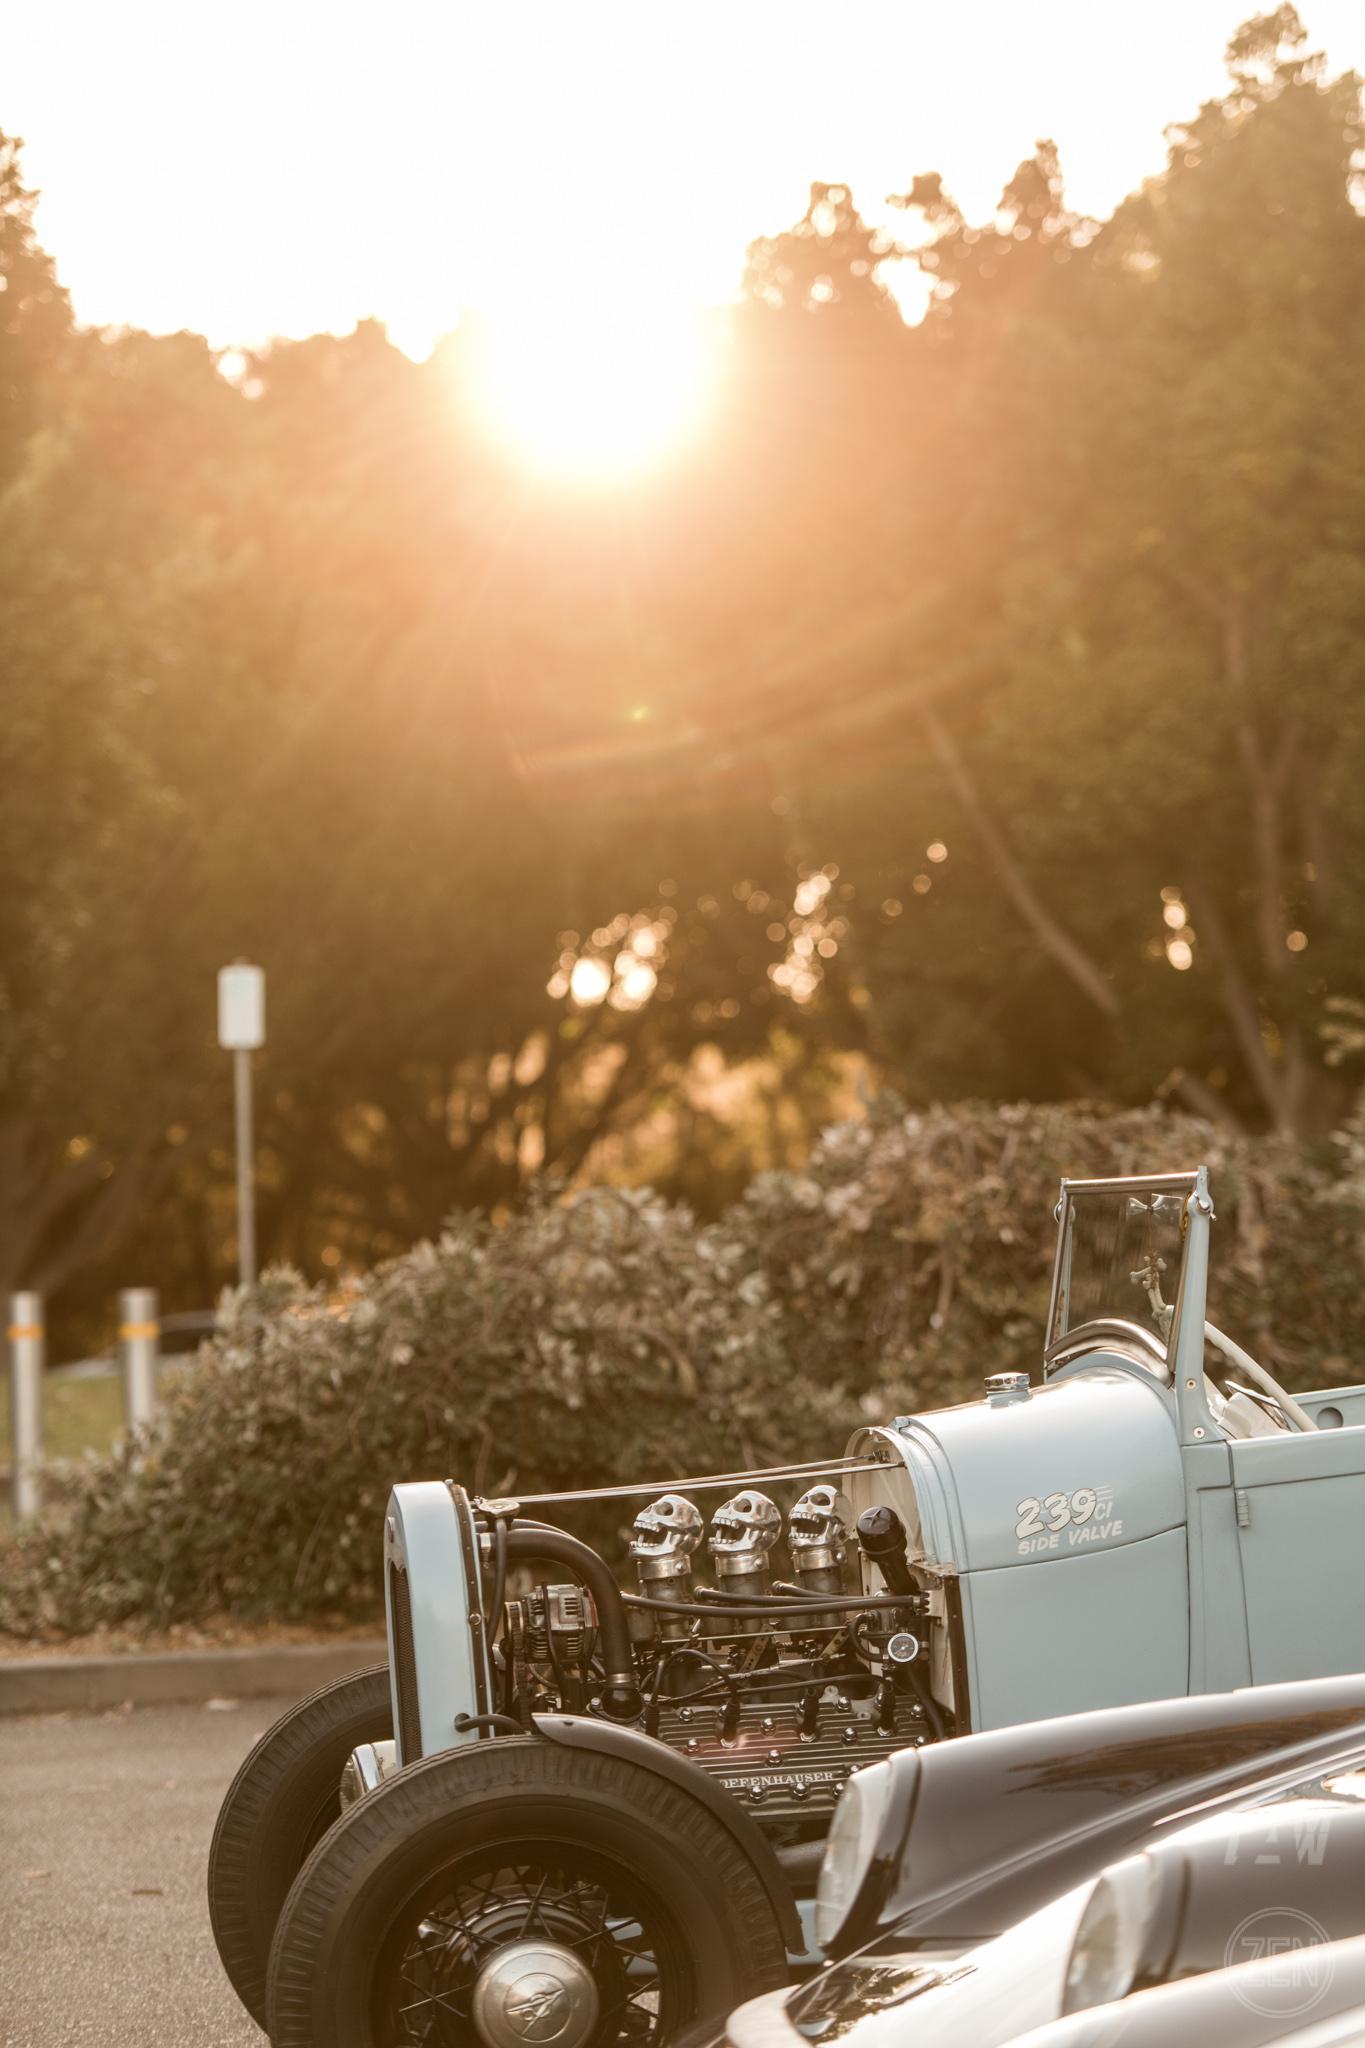 2019-10-27 - Autohaus Porsches & Coffee 026